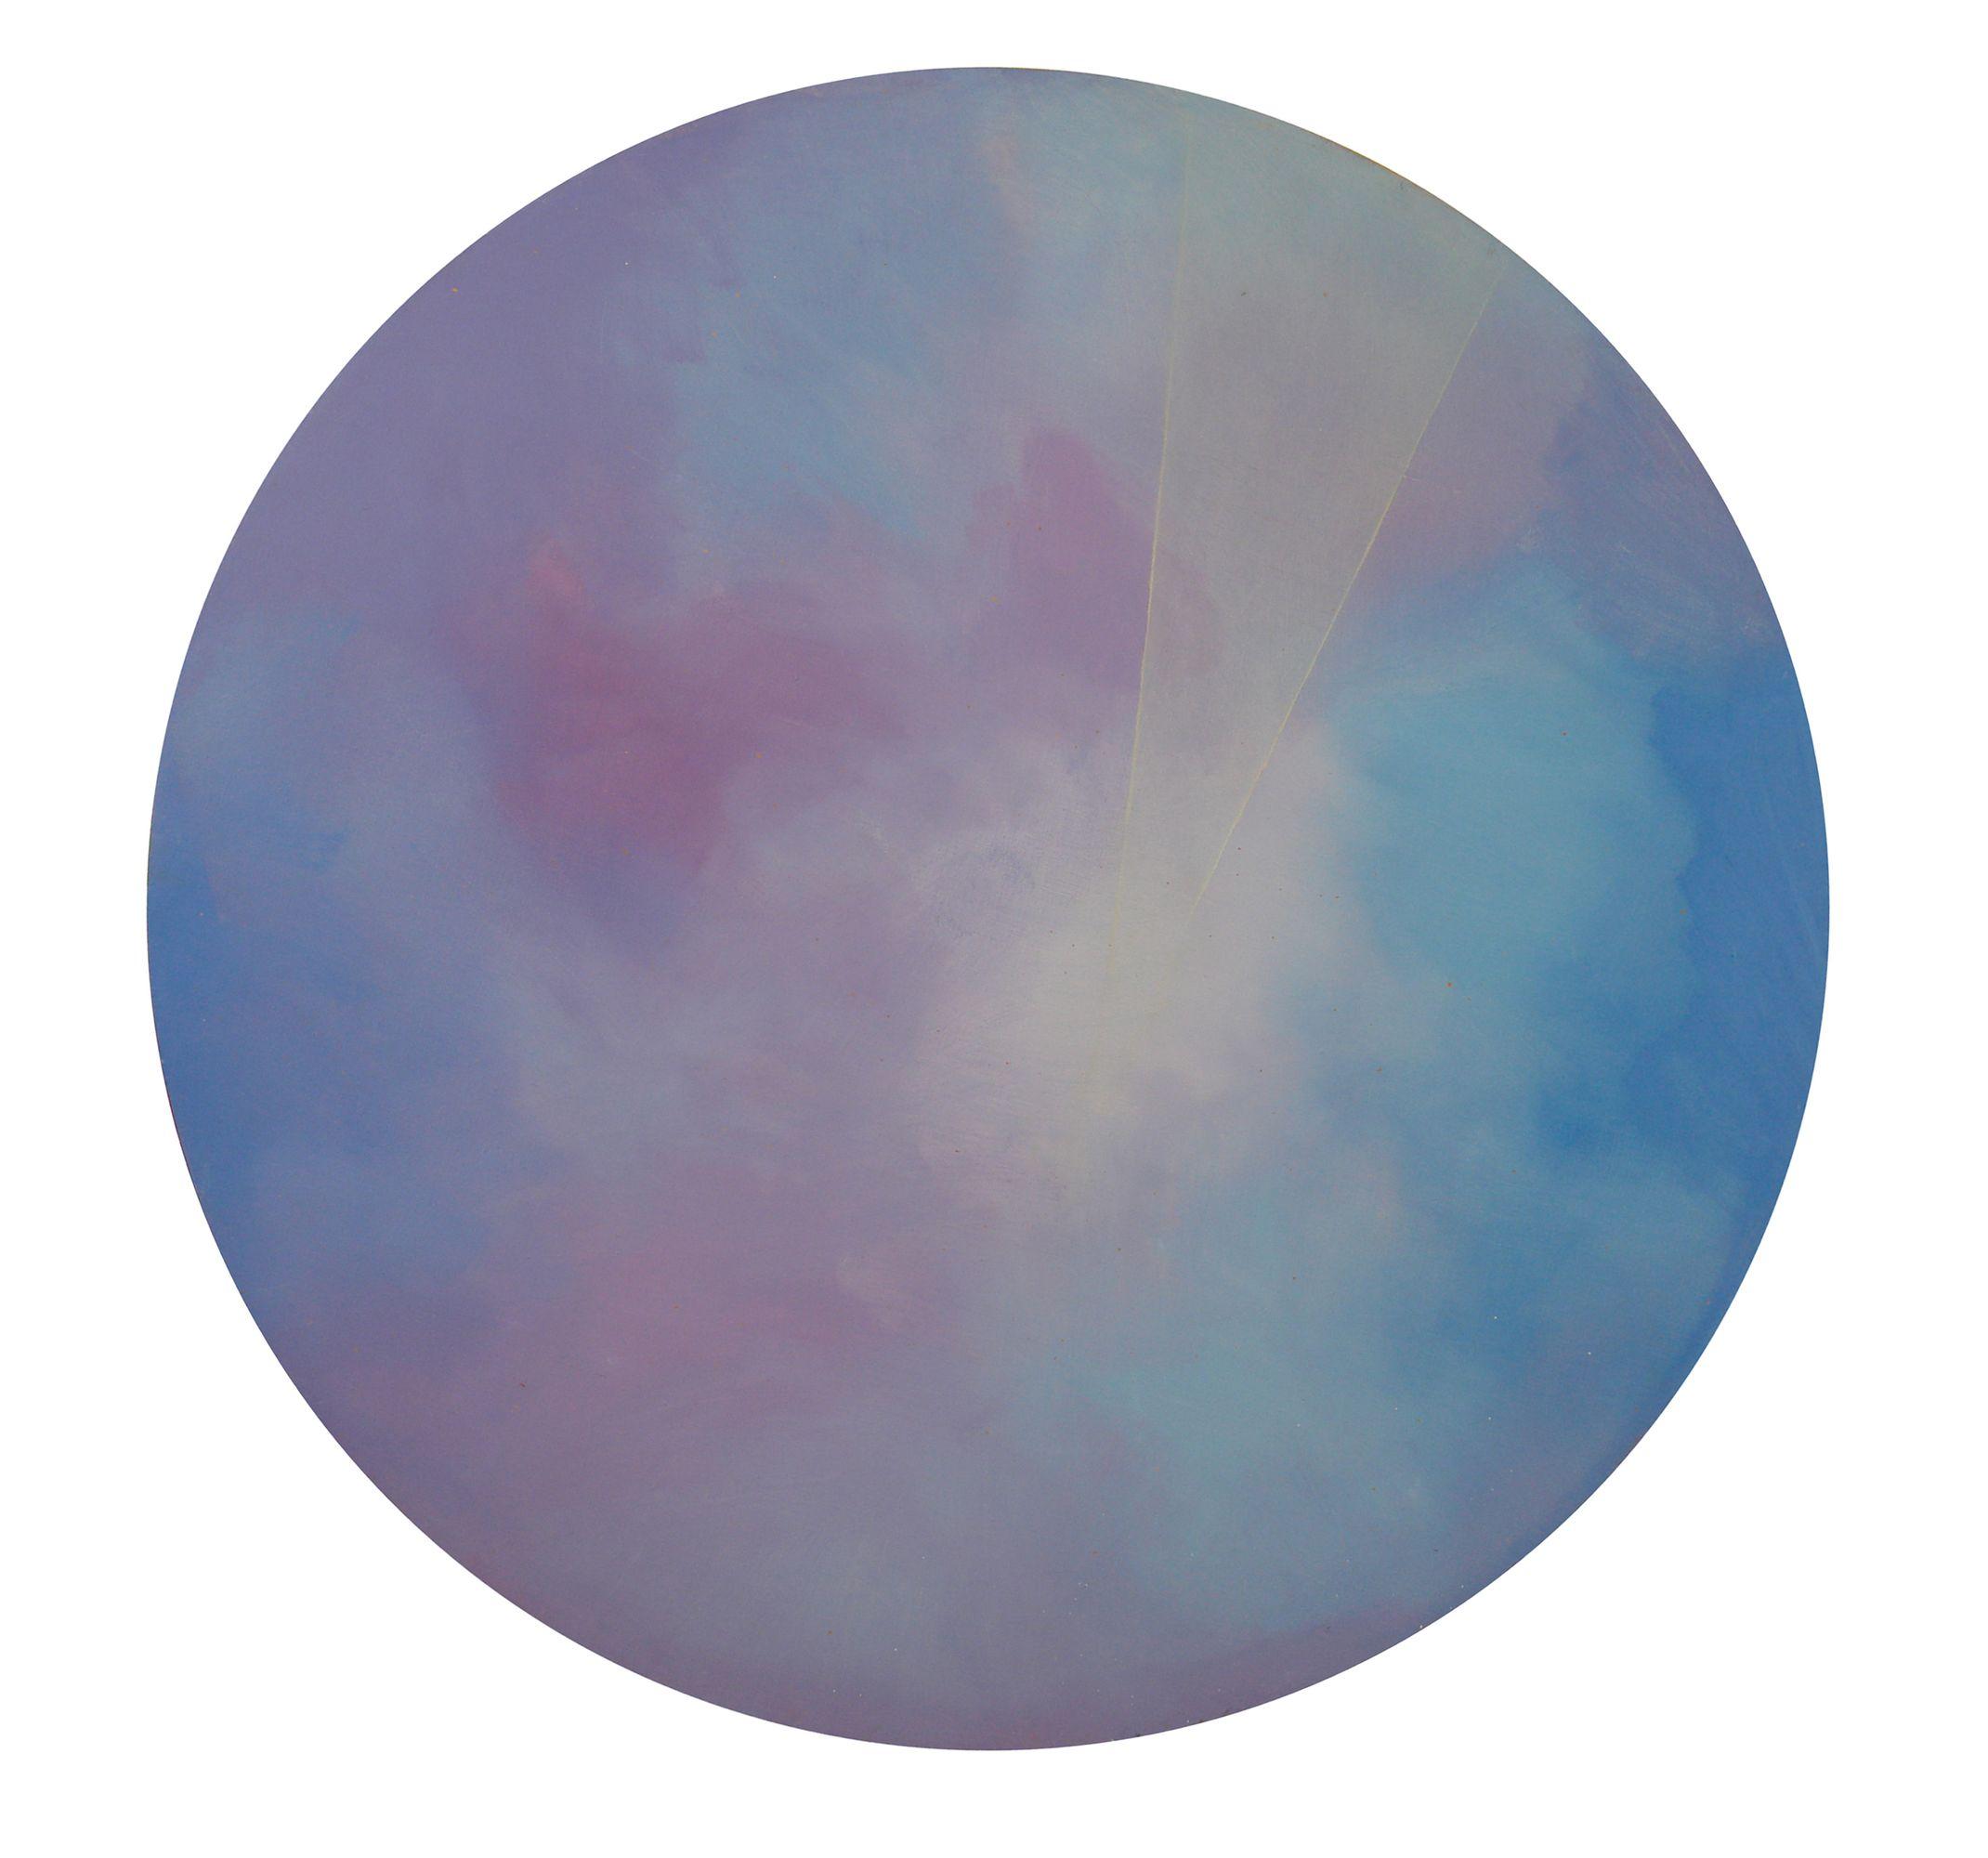 THE MYSTERY OF THE ORIGIN OF LIGHT, 2012, oil on canvas, original media, 110cm.